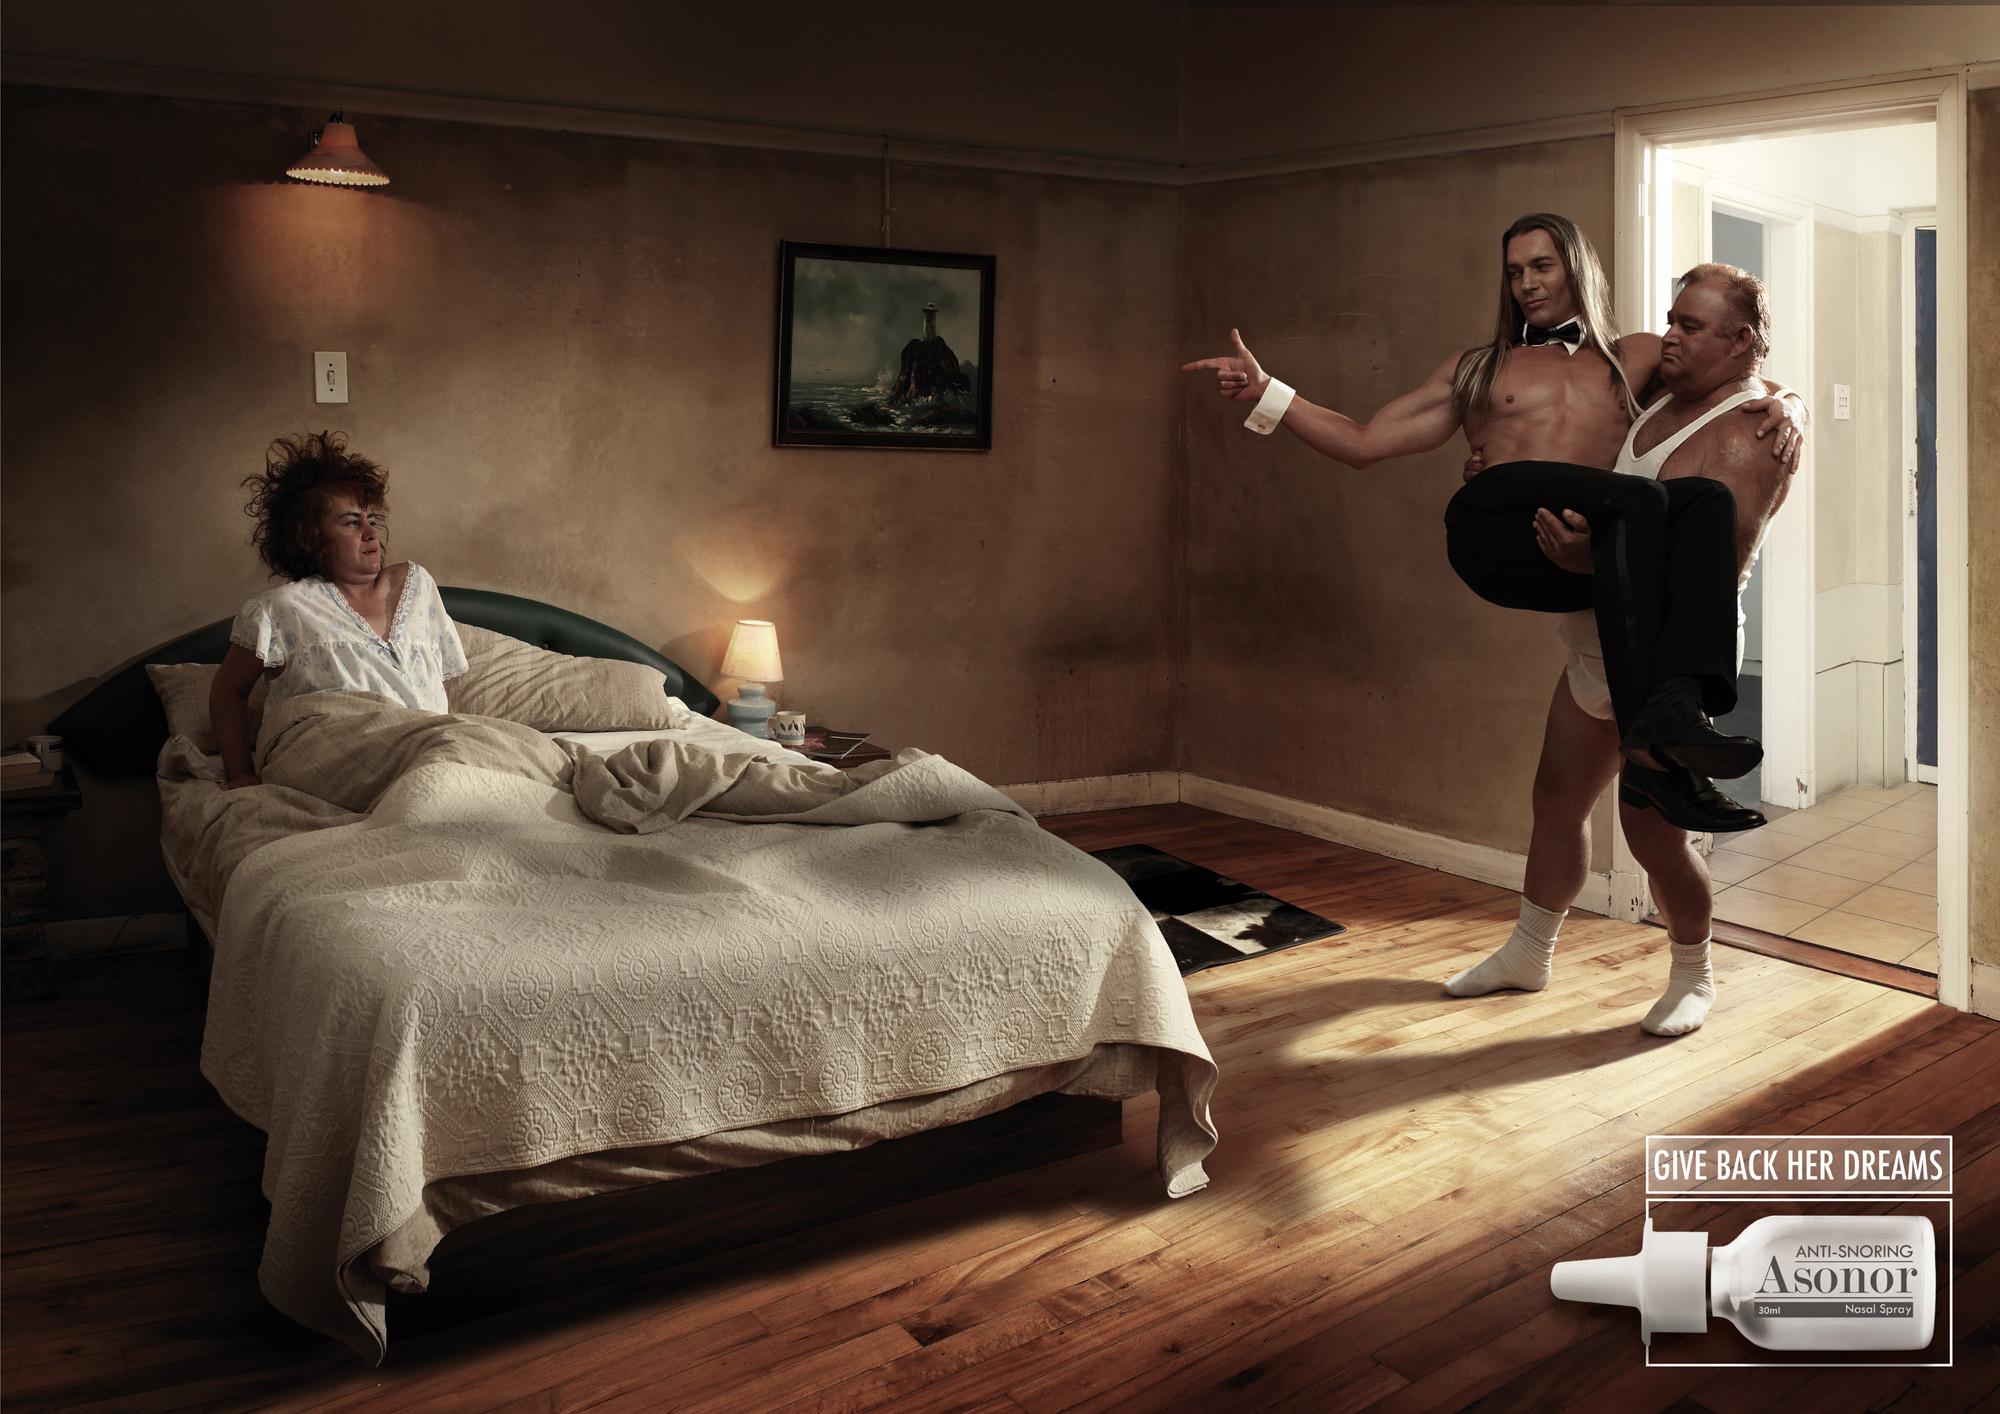 Фото сна супругов 5 фотография